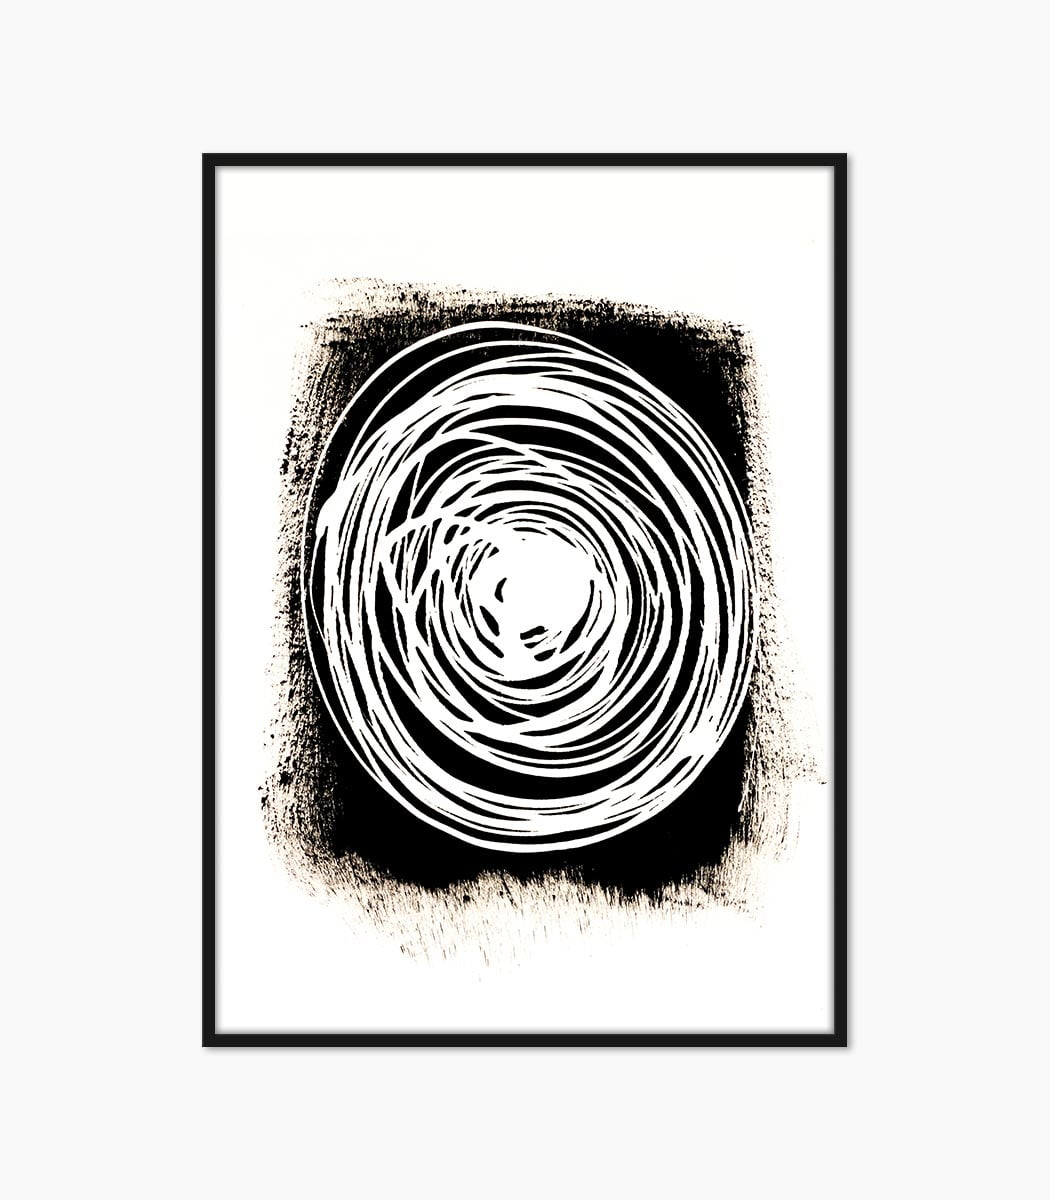 print abstract spirala creat manual si printat la calitate superioara numai pe www.artwall.ro